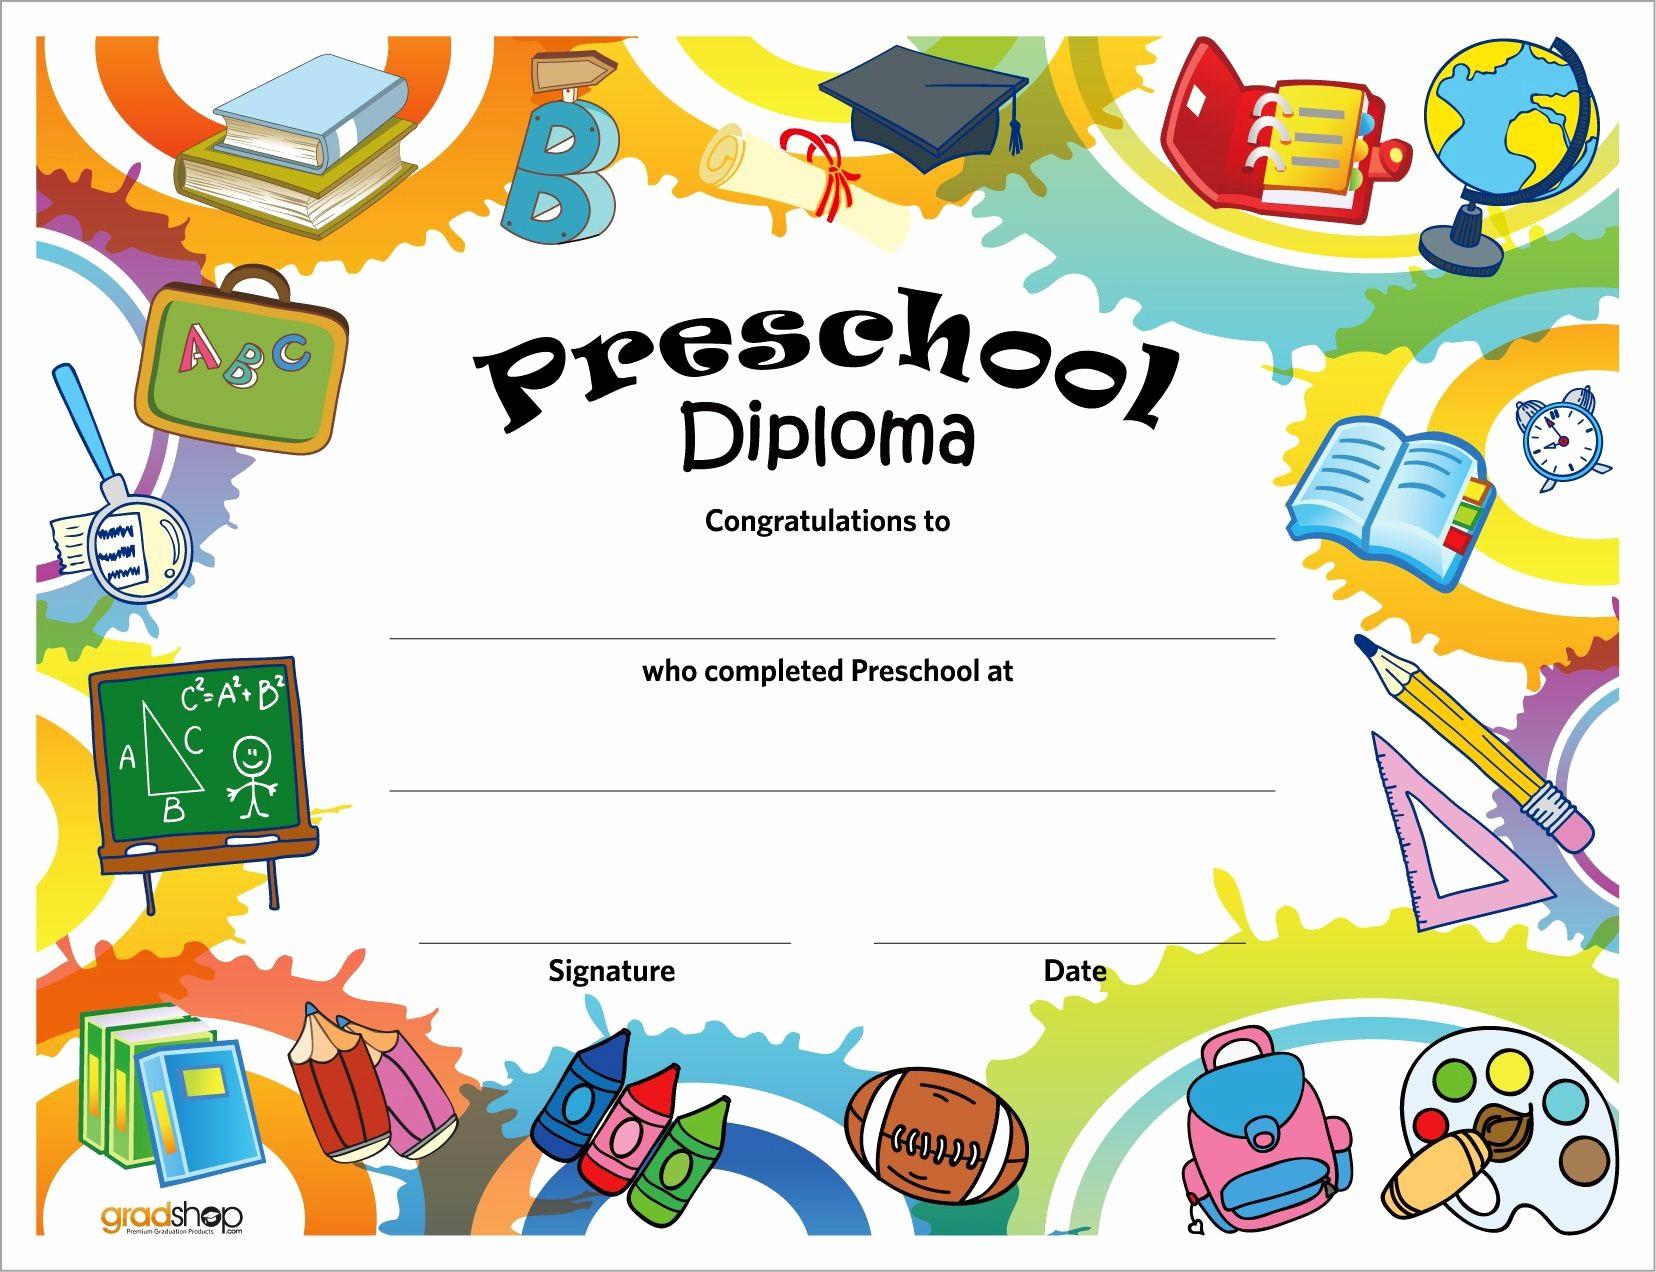 Preschool Graduation Certificate Free Printable Elegant Free Printable Preschool Diplomas